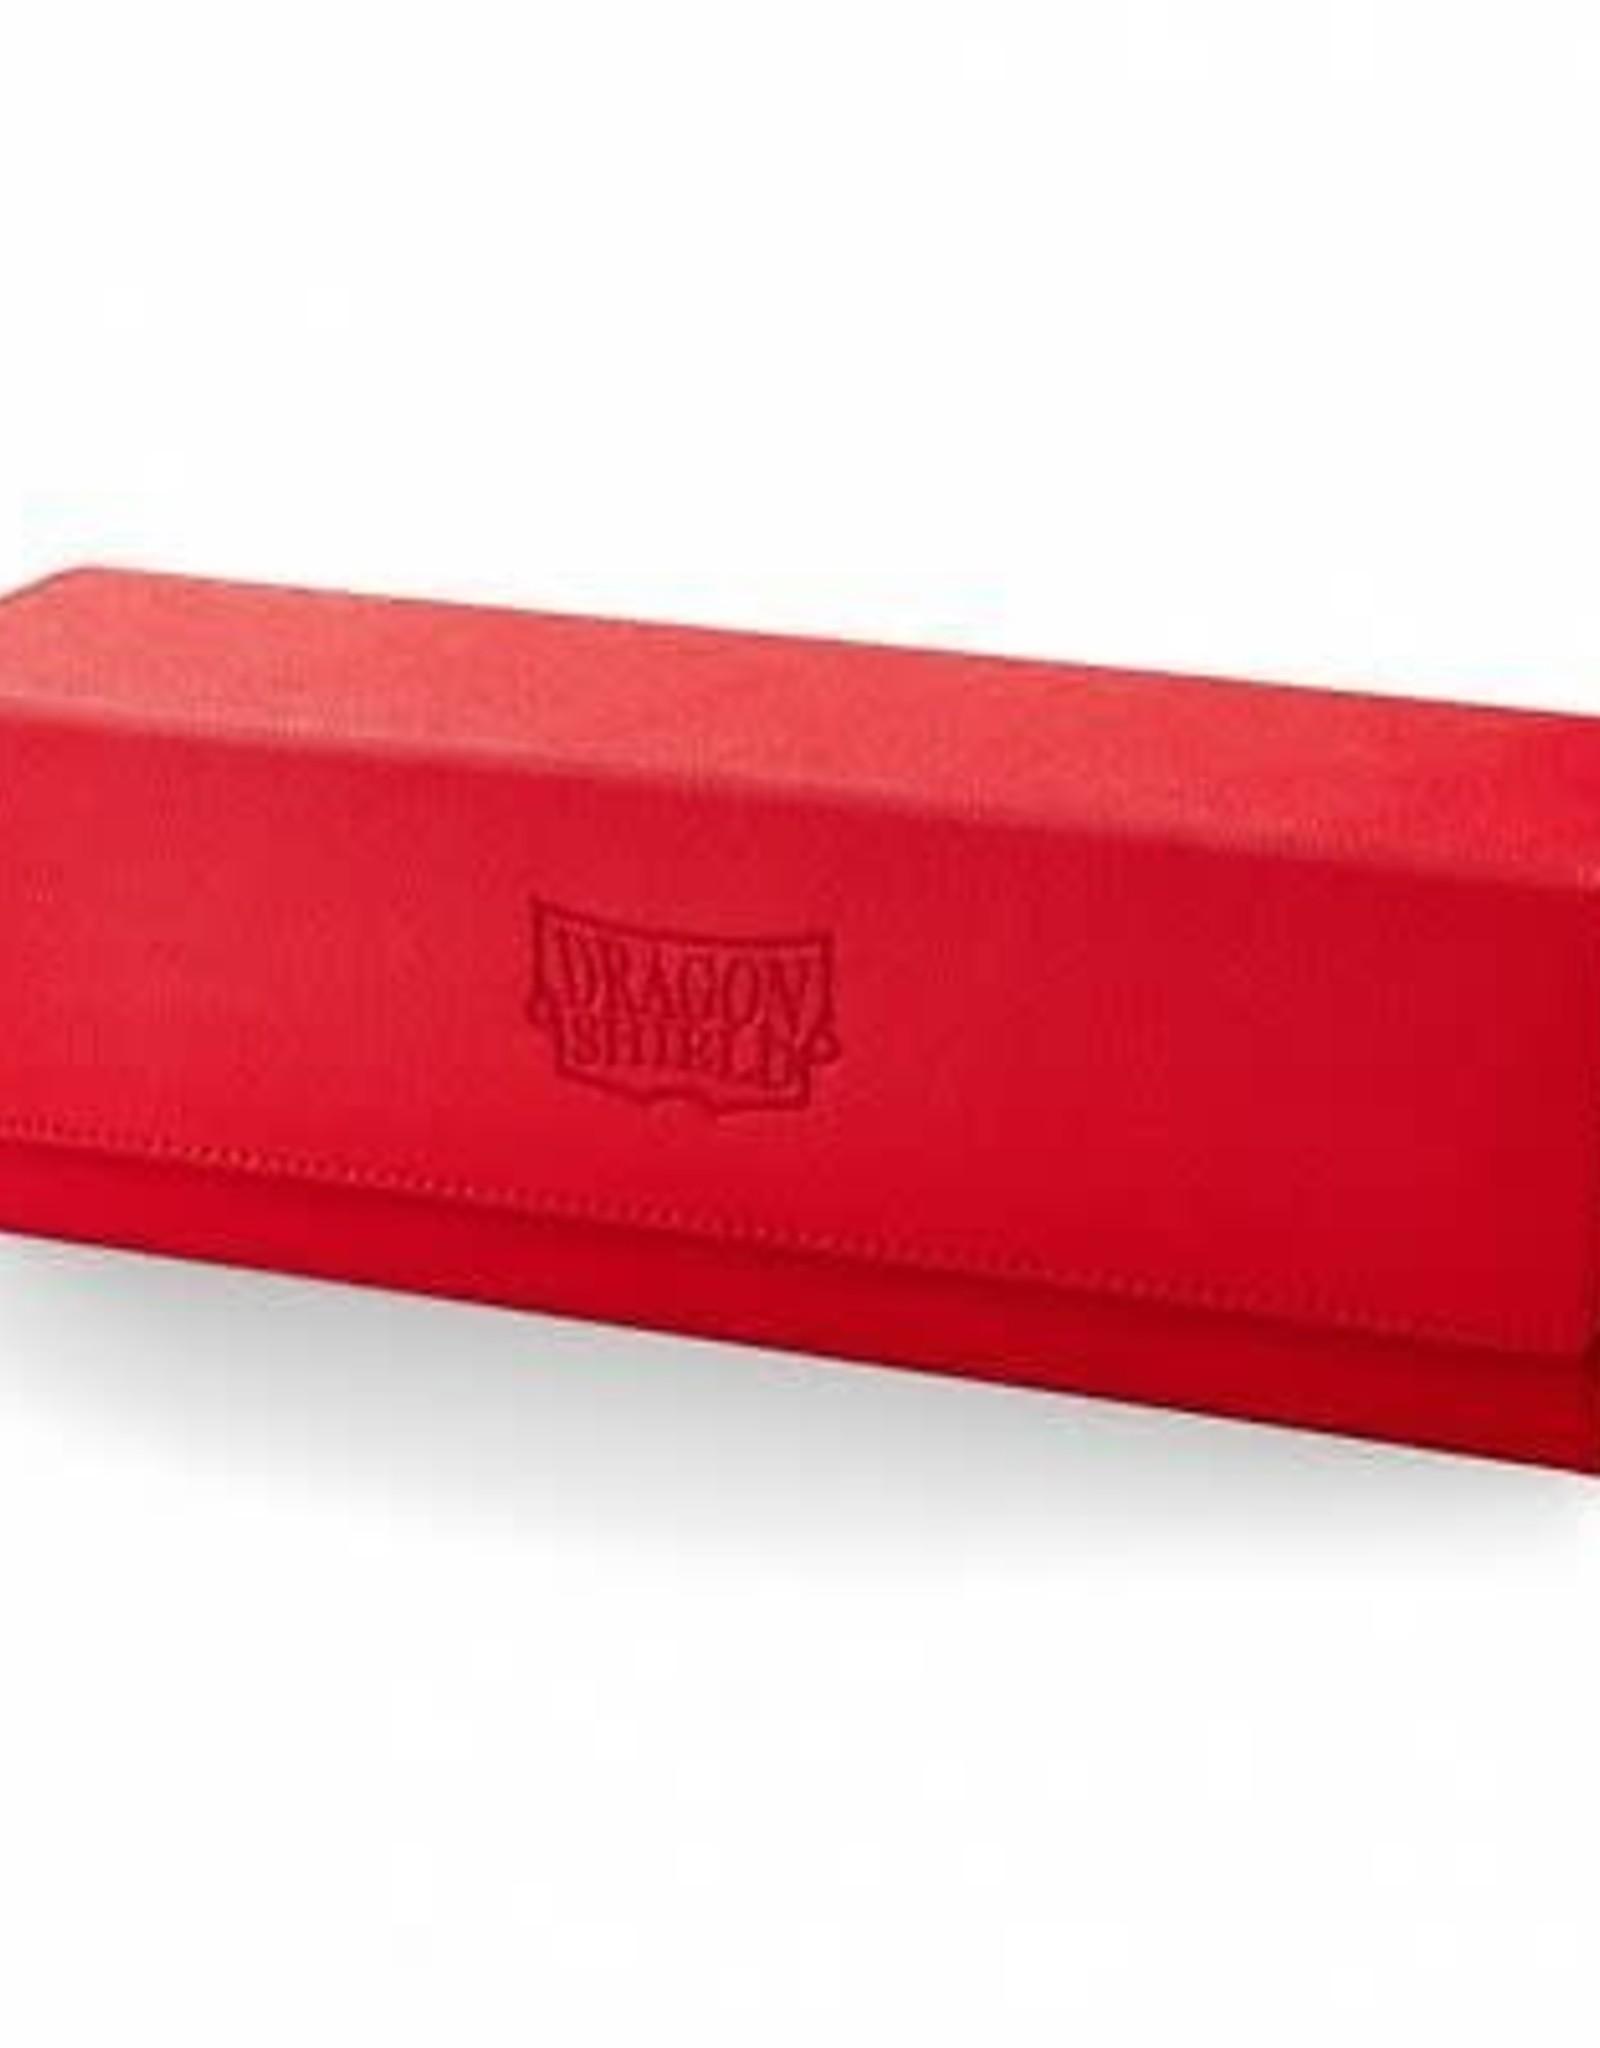 Arcane Tinmen Dragon Shield Deck Box: Magic Carpet 500 Red w/ Black